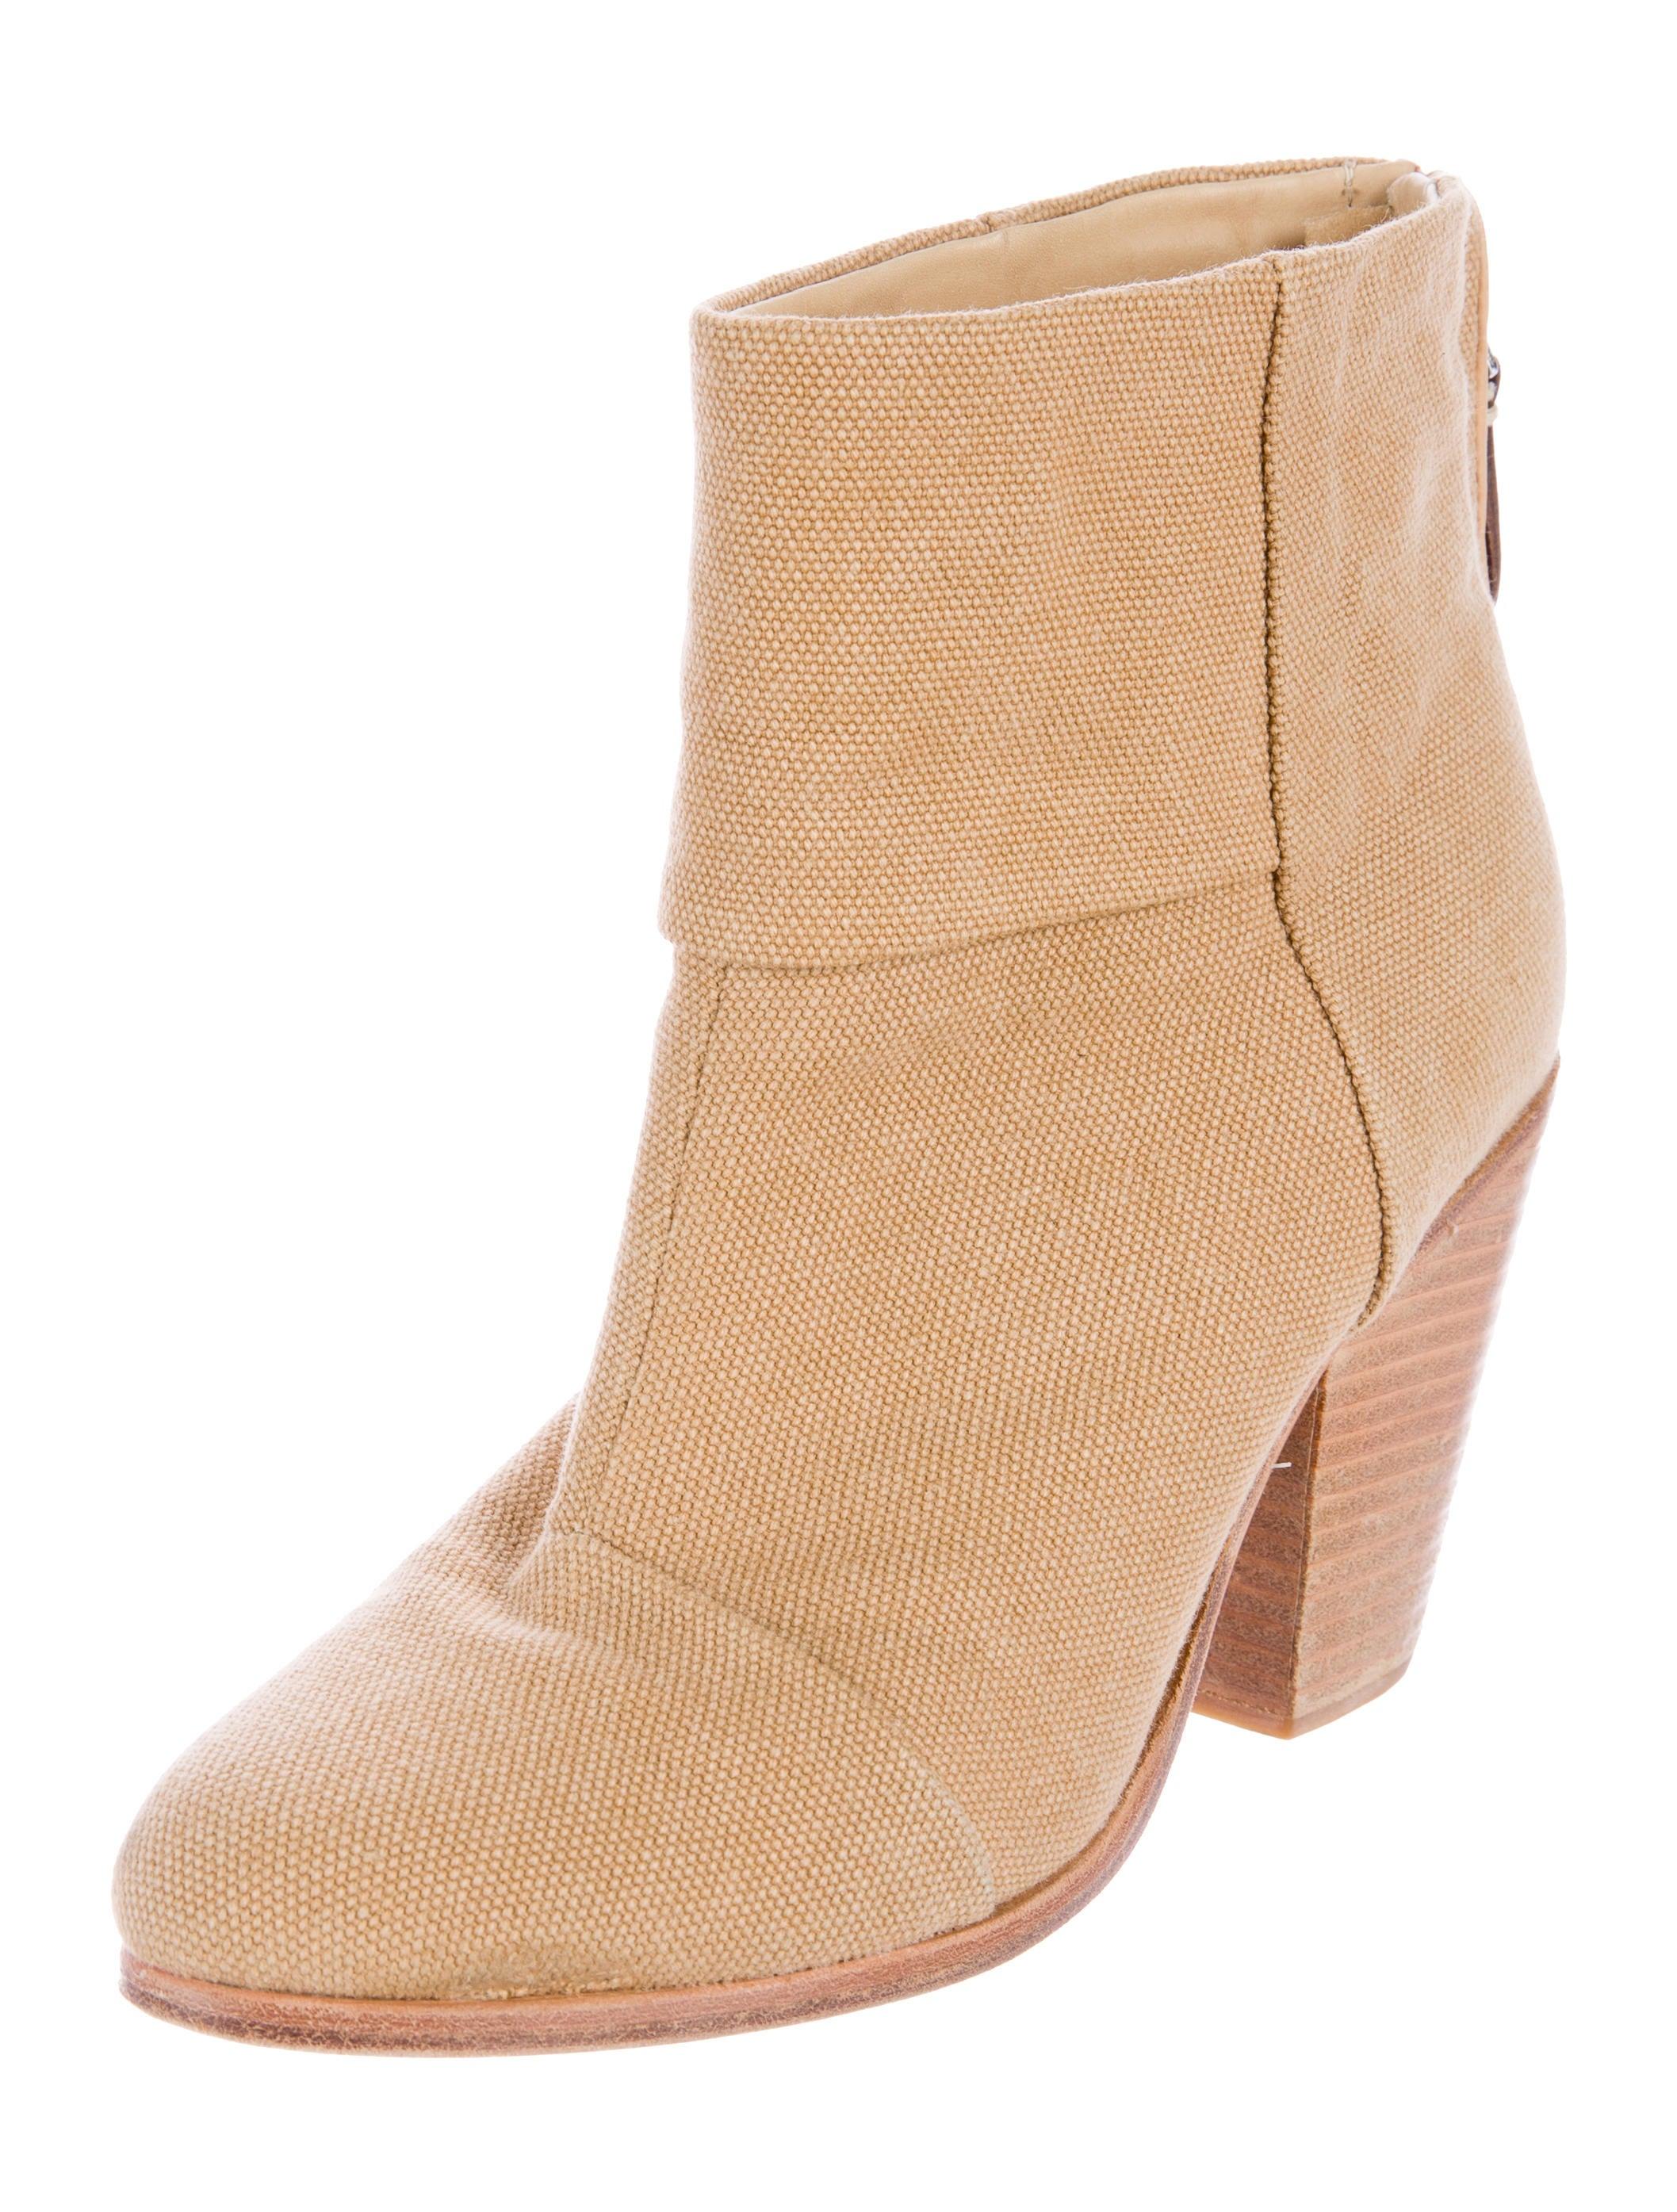 rag bone canvas newbury ankle boots shoes wragb50579